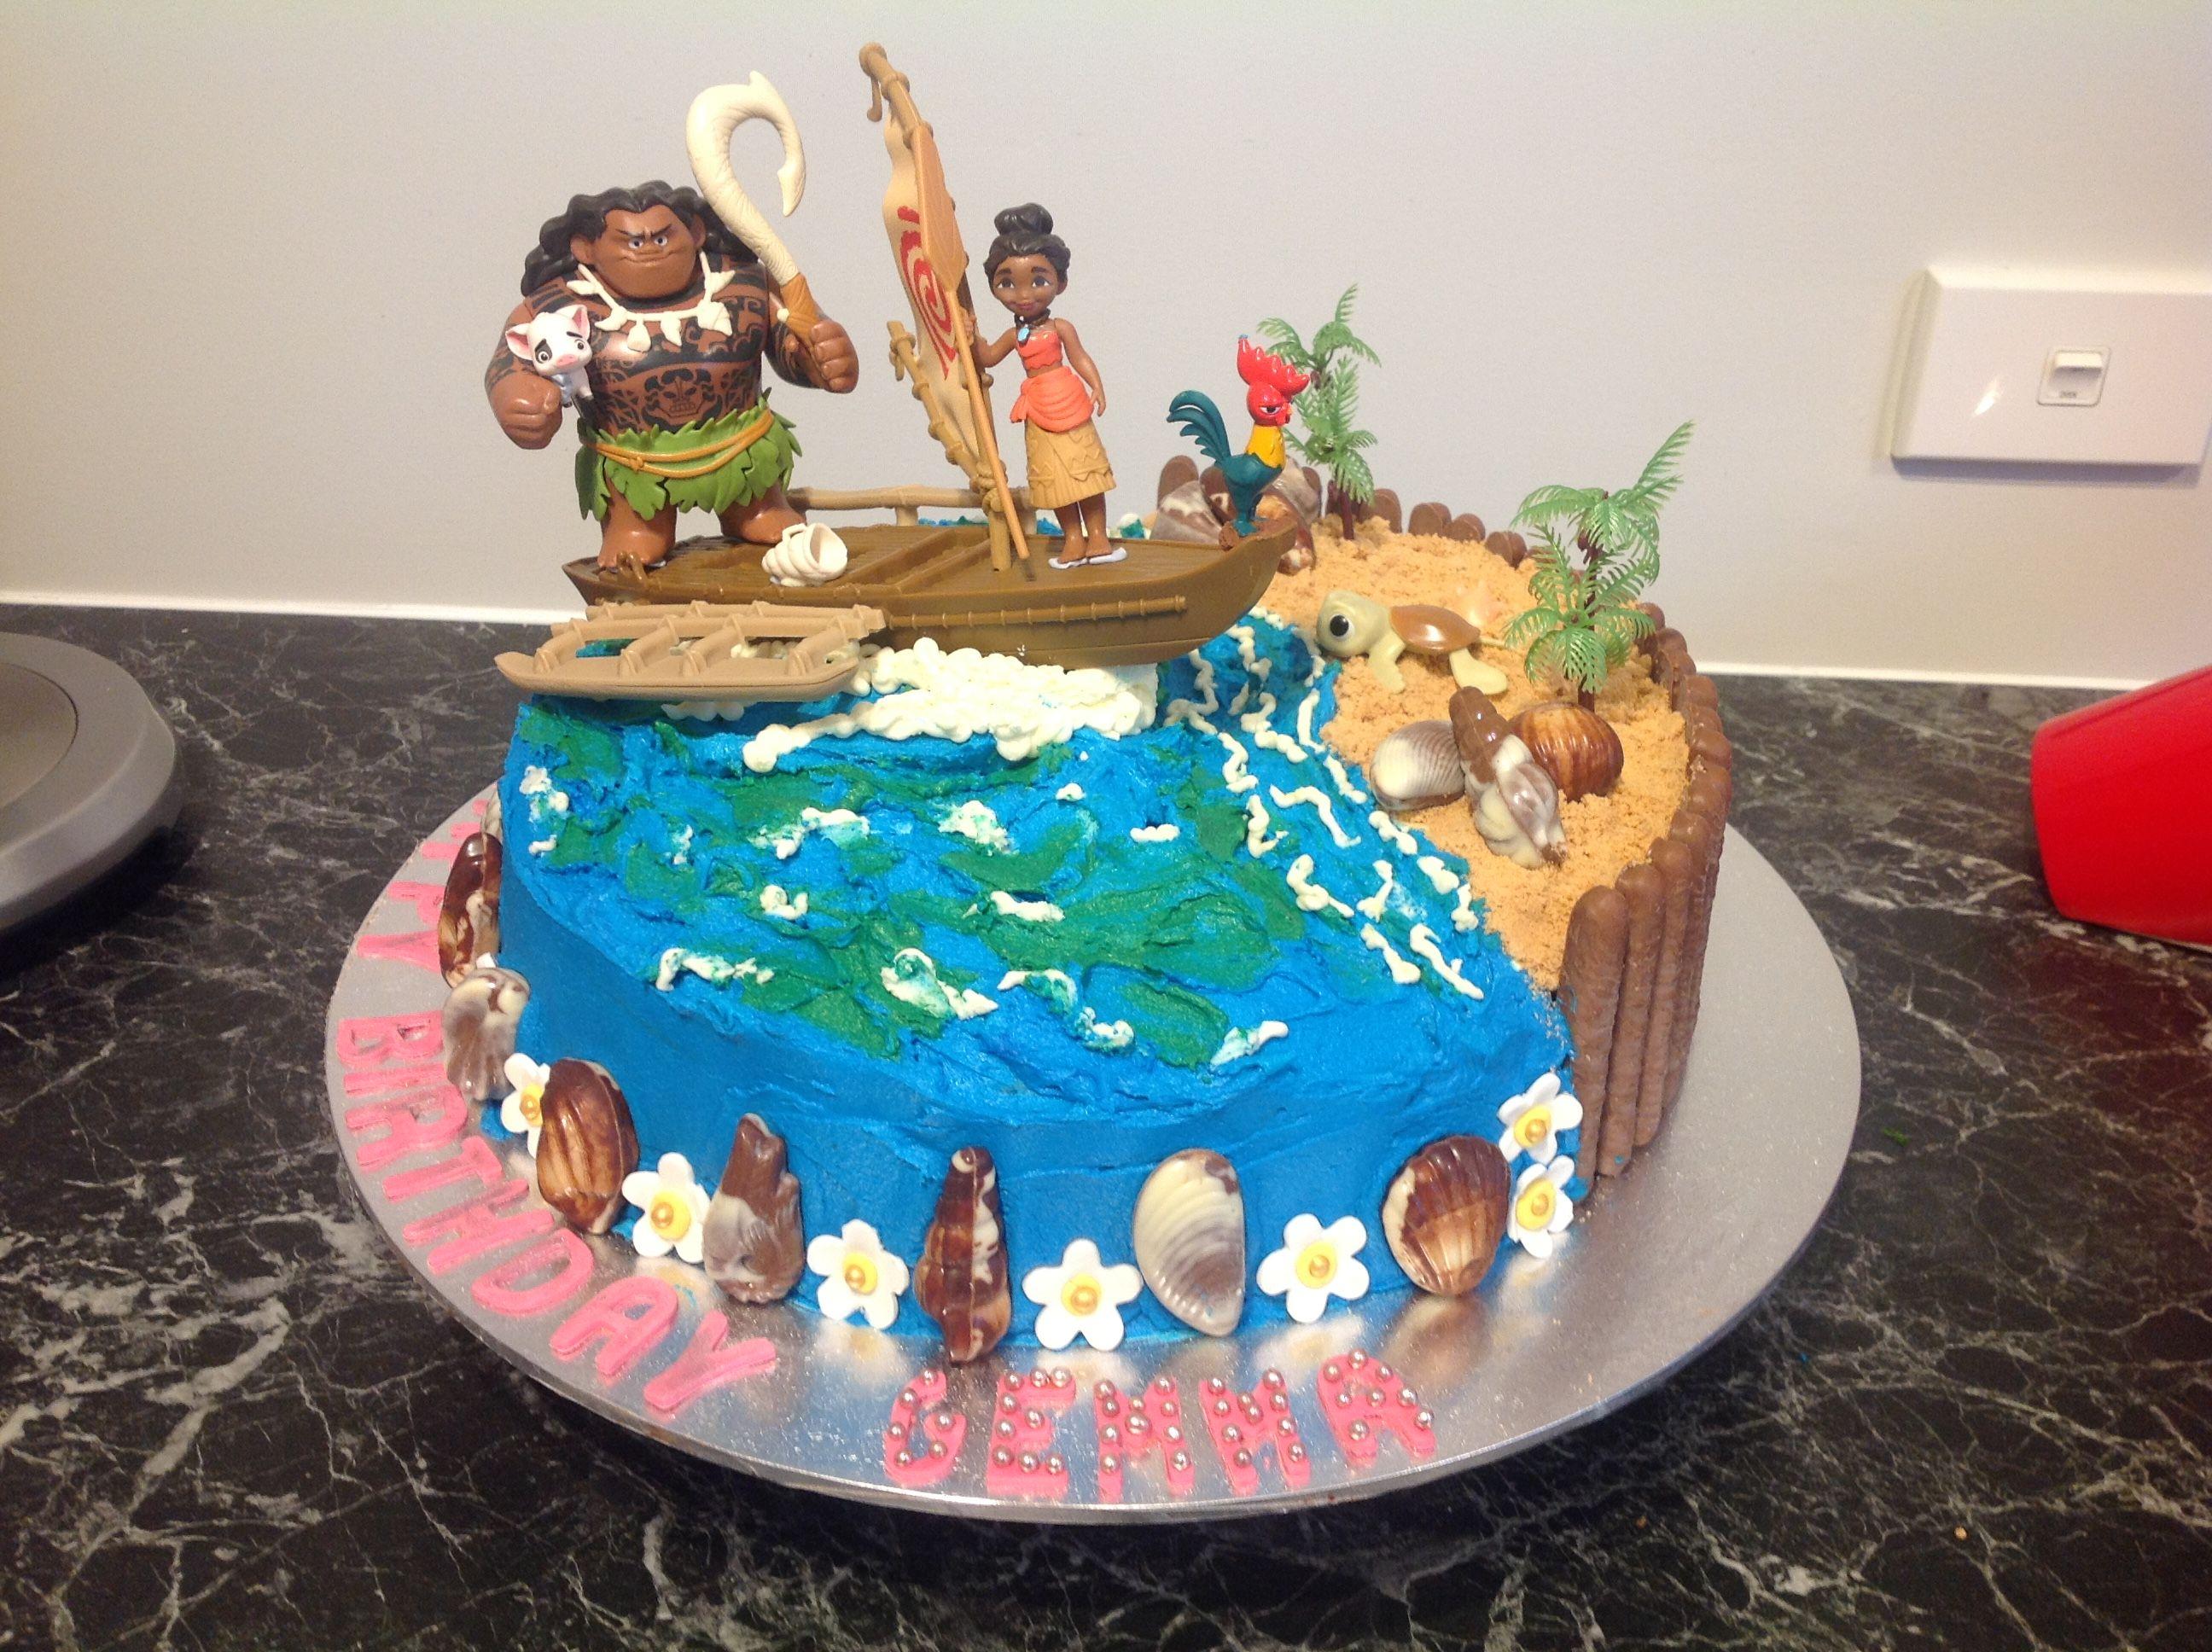 Cake Design Moana : Made this Moana cake for Gemma s 6th Birthday Cakes ...